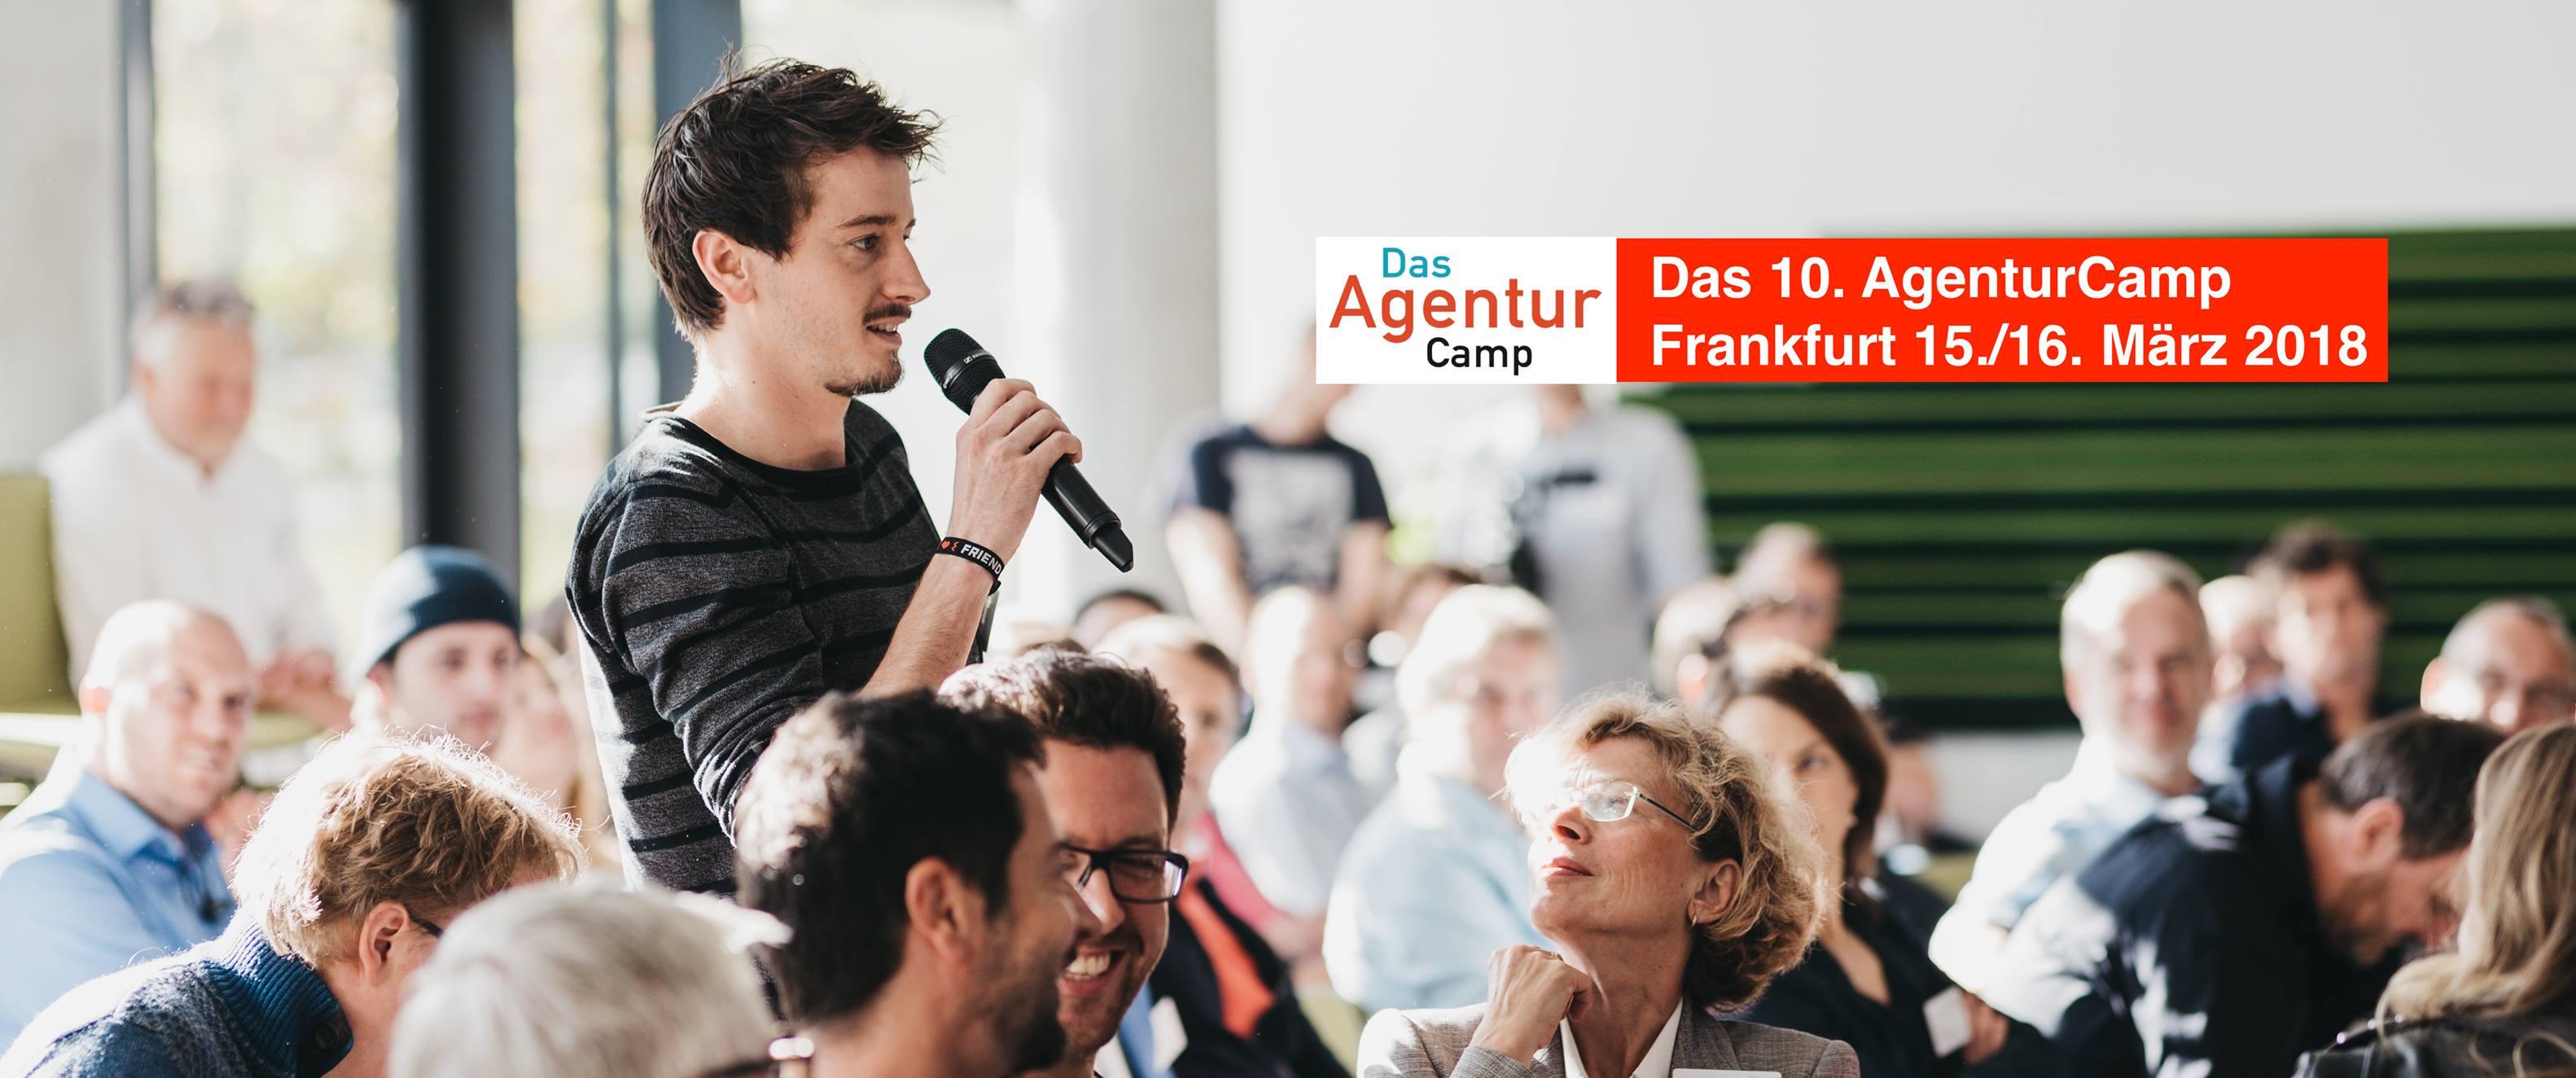 10. AgenturCamp Frankfurt